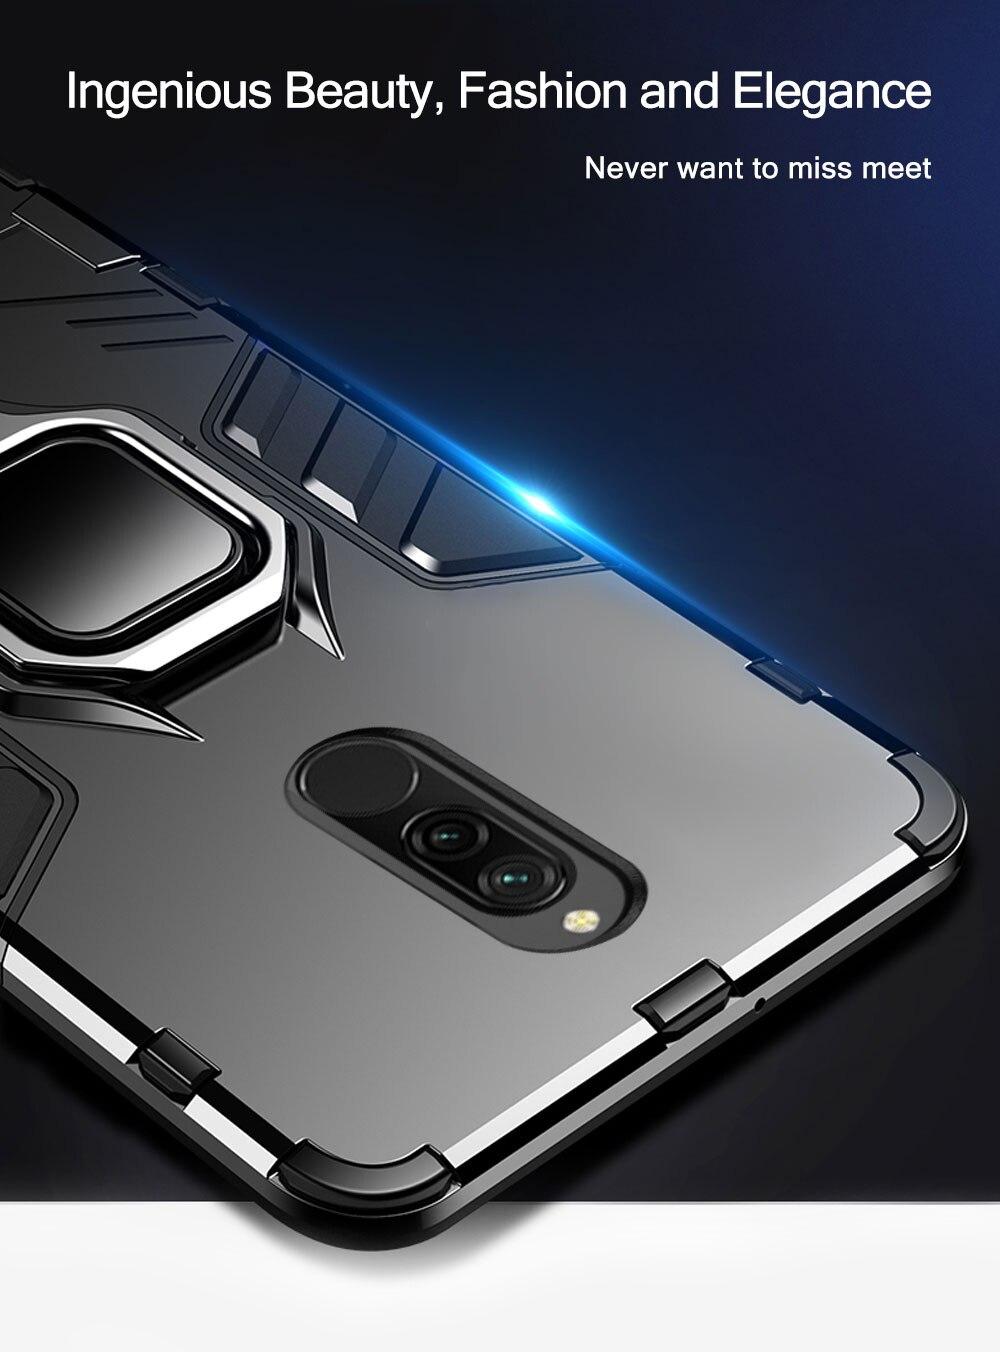 H6196e591b0de4ffeba759e47e85d34c4J Armor Case for Redmi 8 8A Case Magnetic Car Phone Holder TPU+PC Bumper Cover on for Xiaomi Redmi 8 8A 8 A Global Version Case